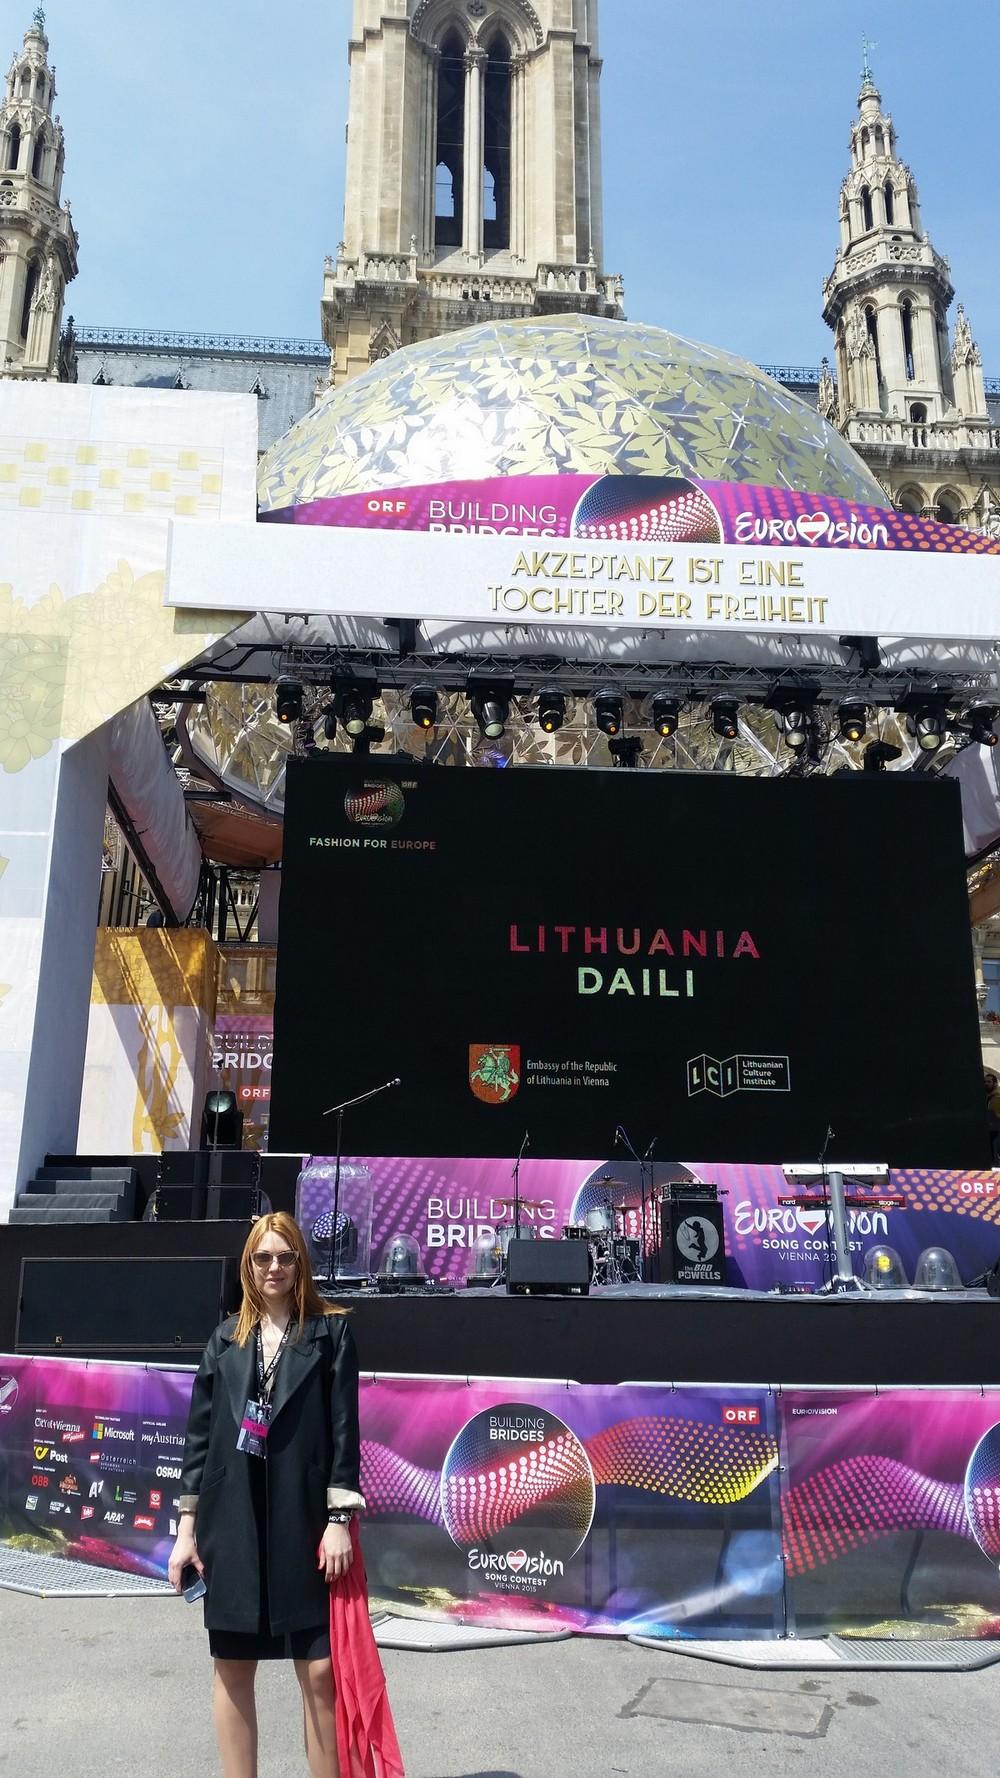 Lauros Dailidenienes prekes zenklo 'Daili' pristatymas Austrijoje Vienoje (13)